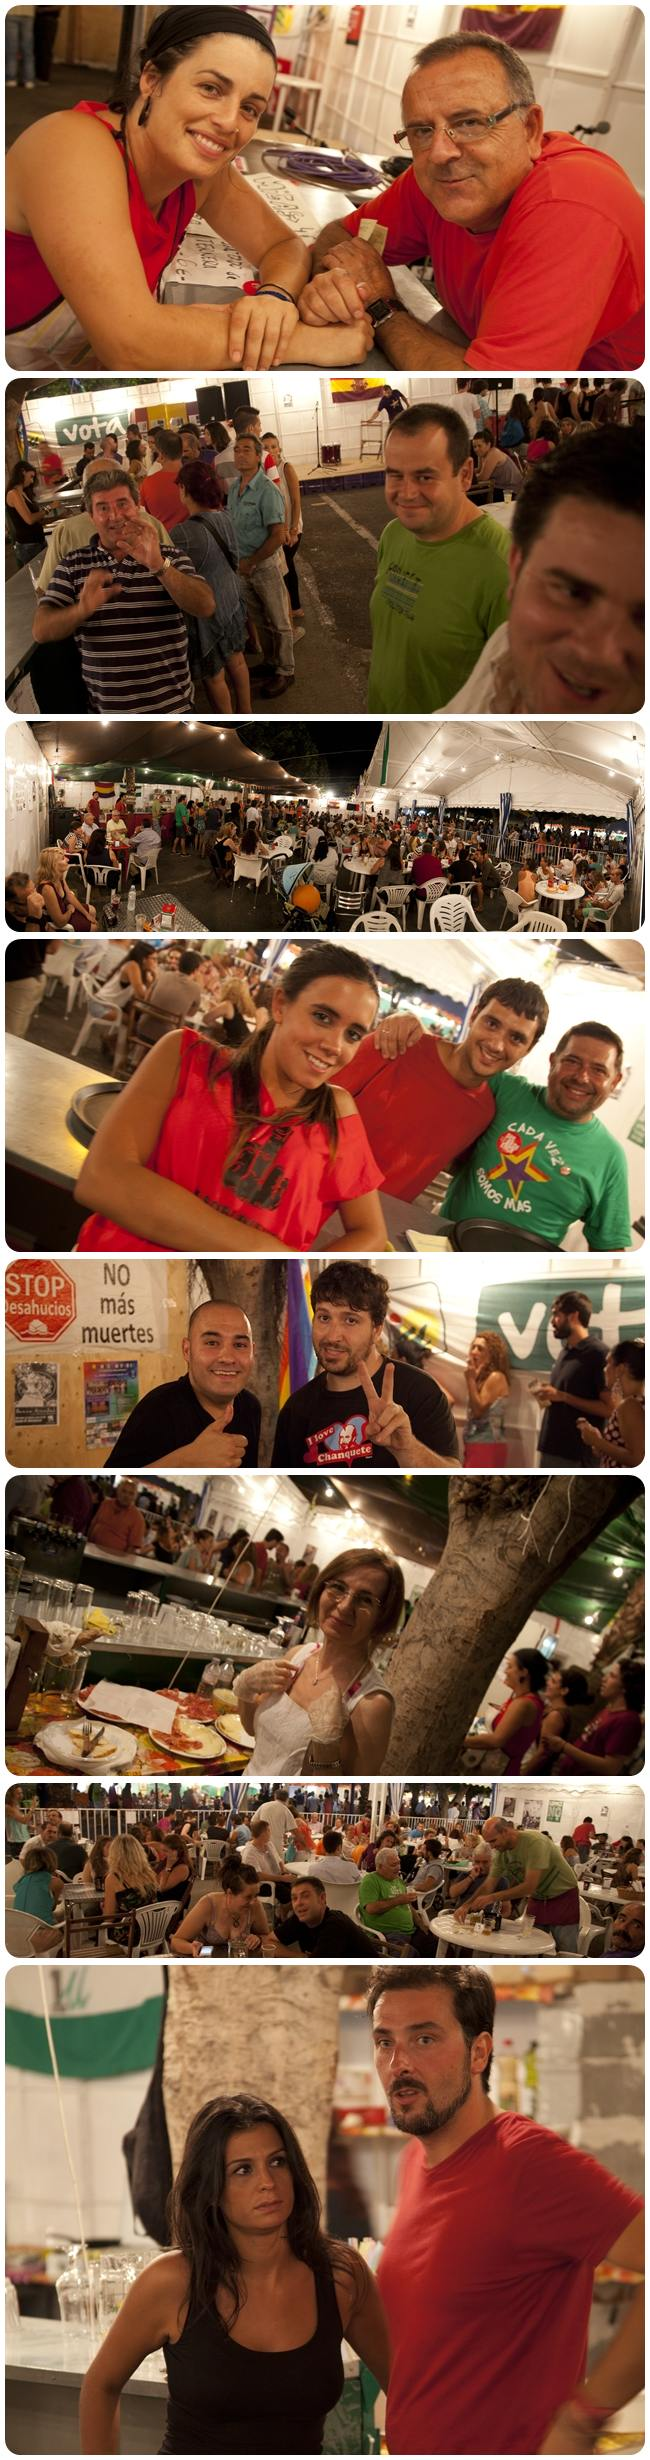 20130824172932-ferias4.jpg